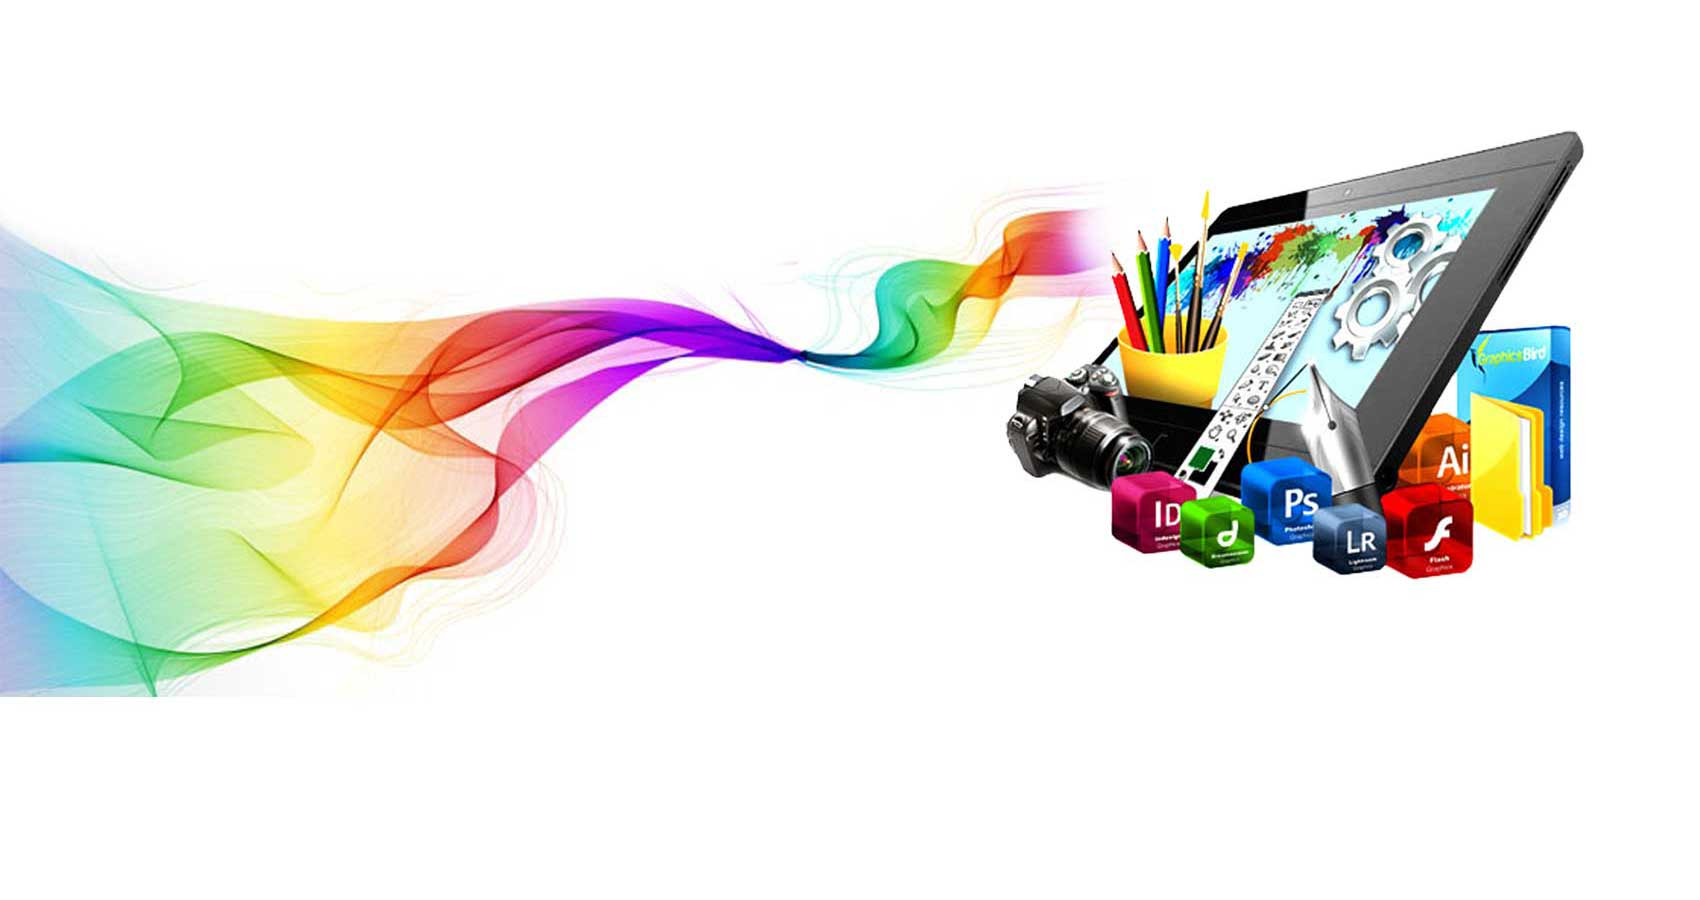 Graphic Design Internship Program